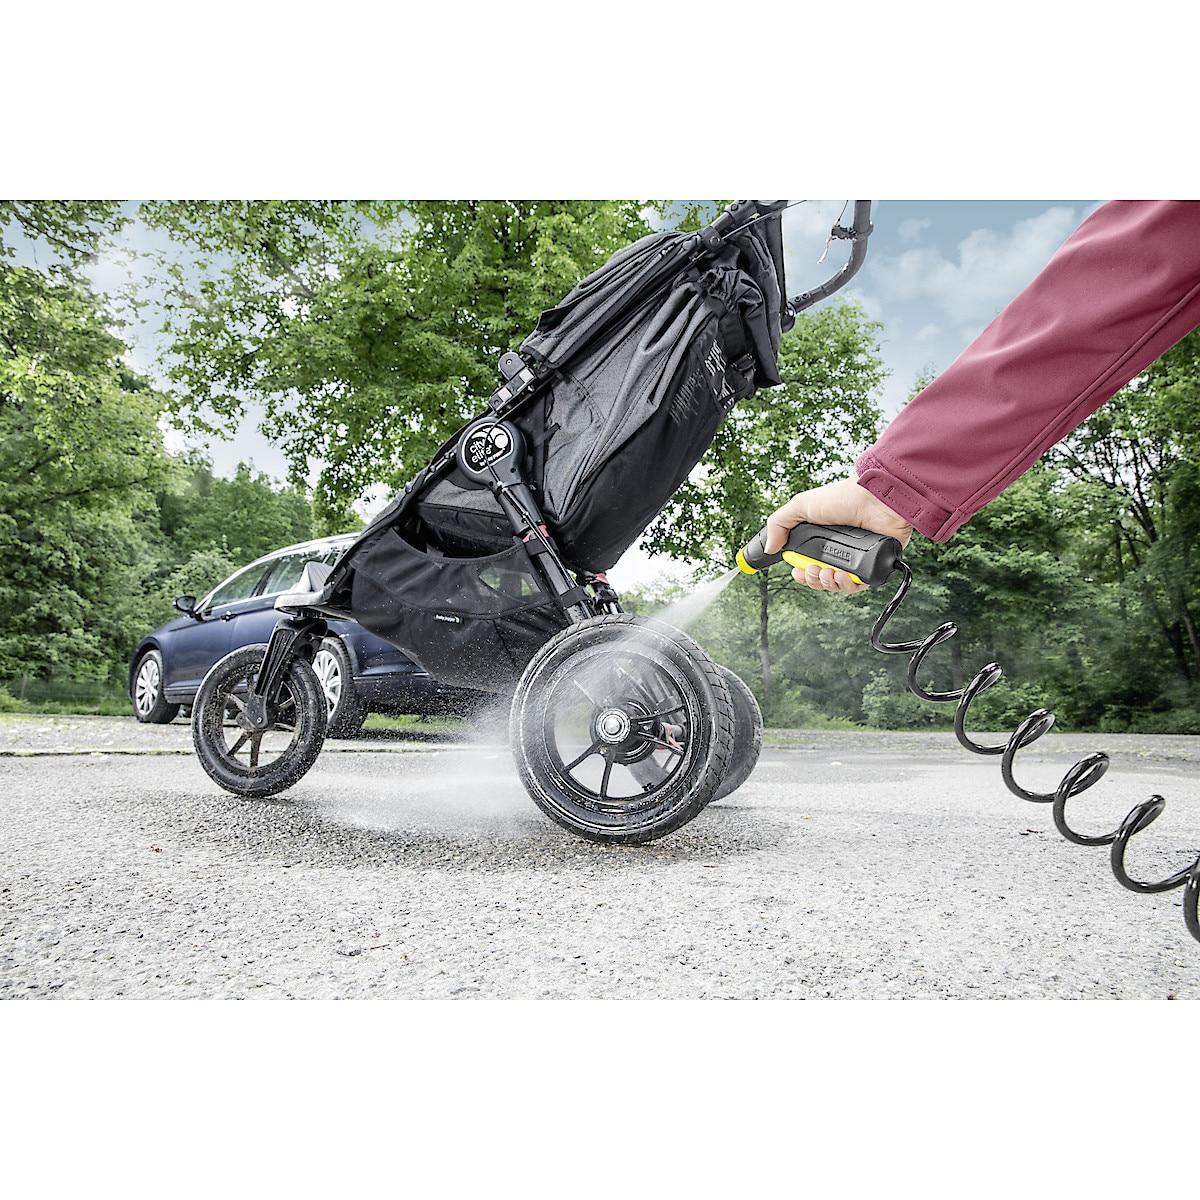 Kärcher OC3 Bike, mobil spyler